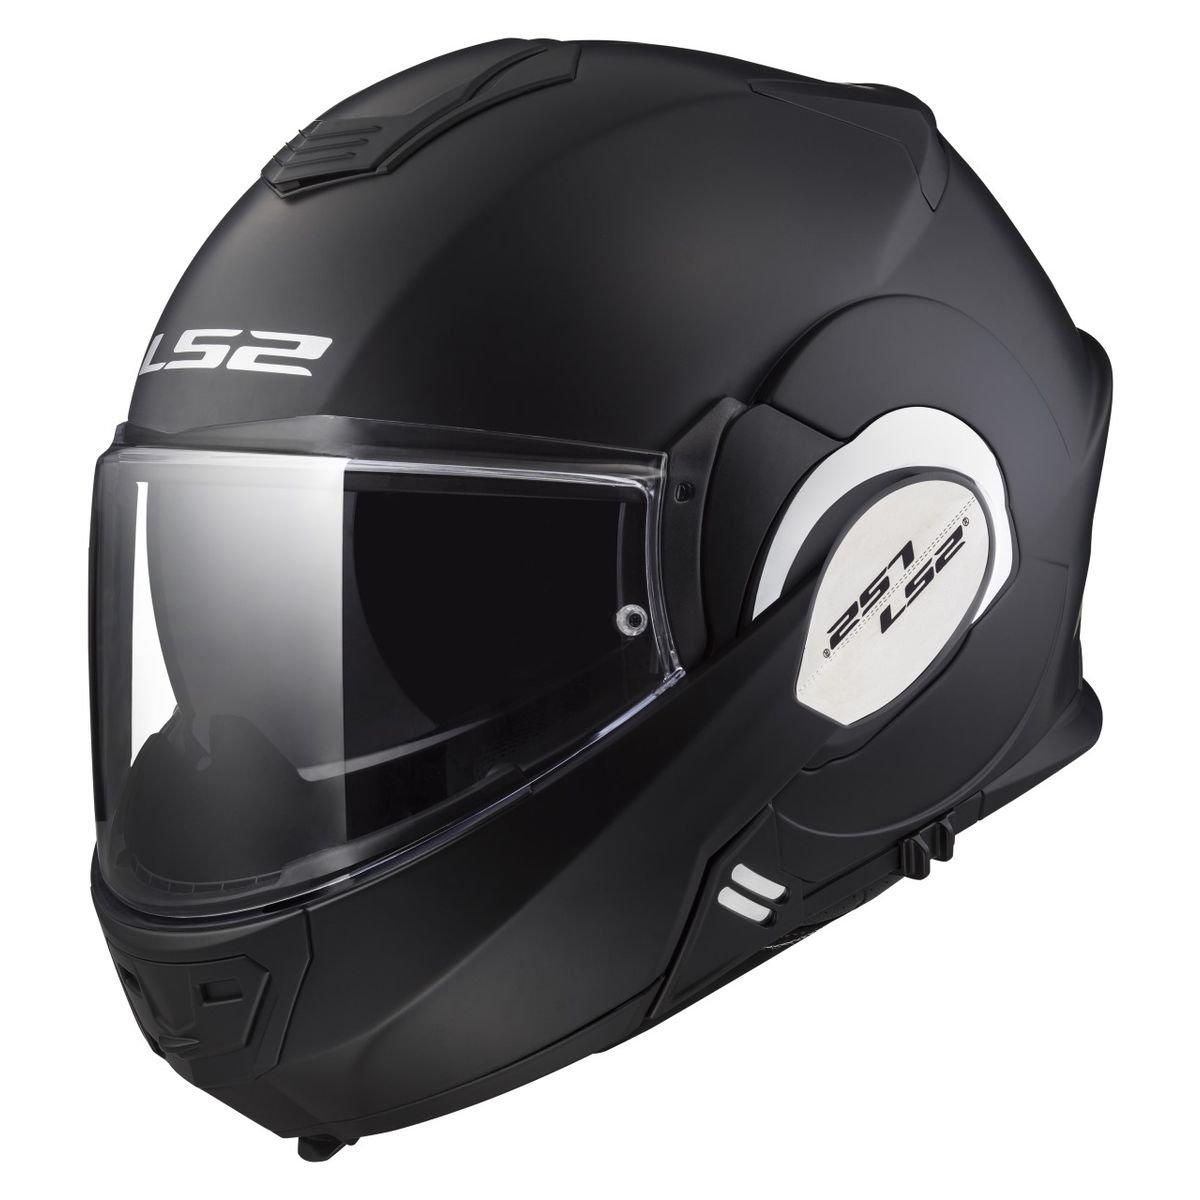 LS2 Helmets Motorcycles Powersports Modular